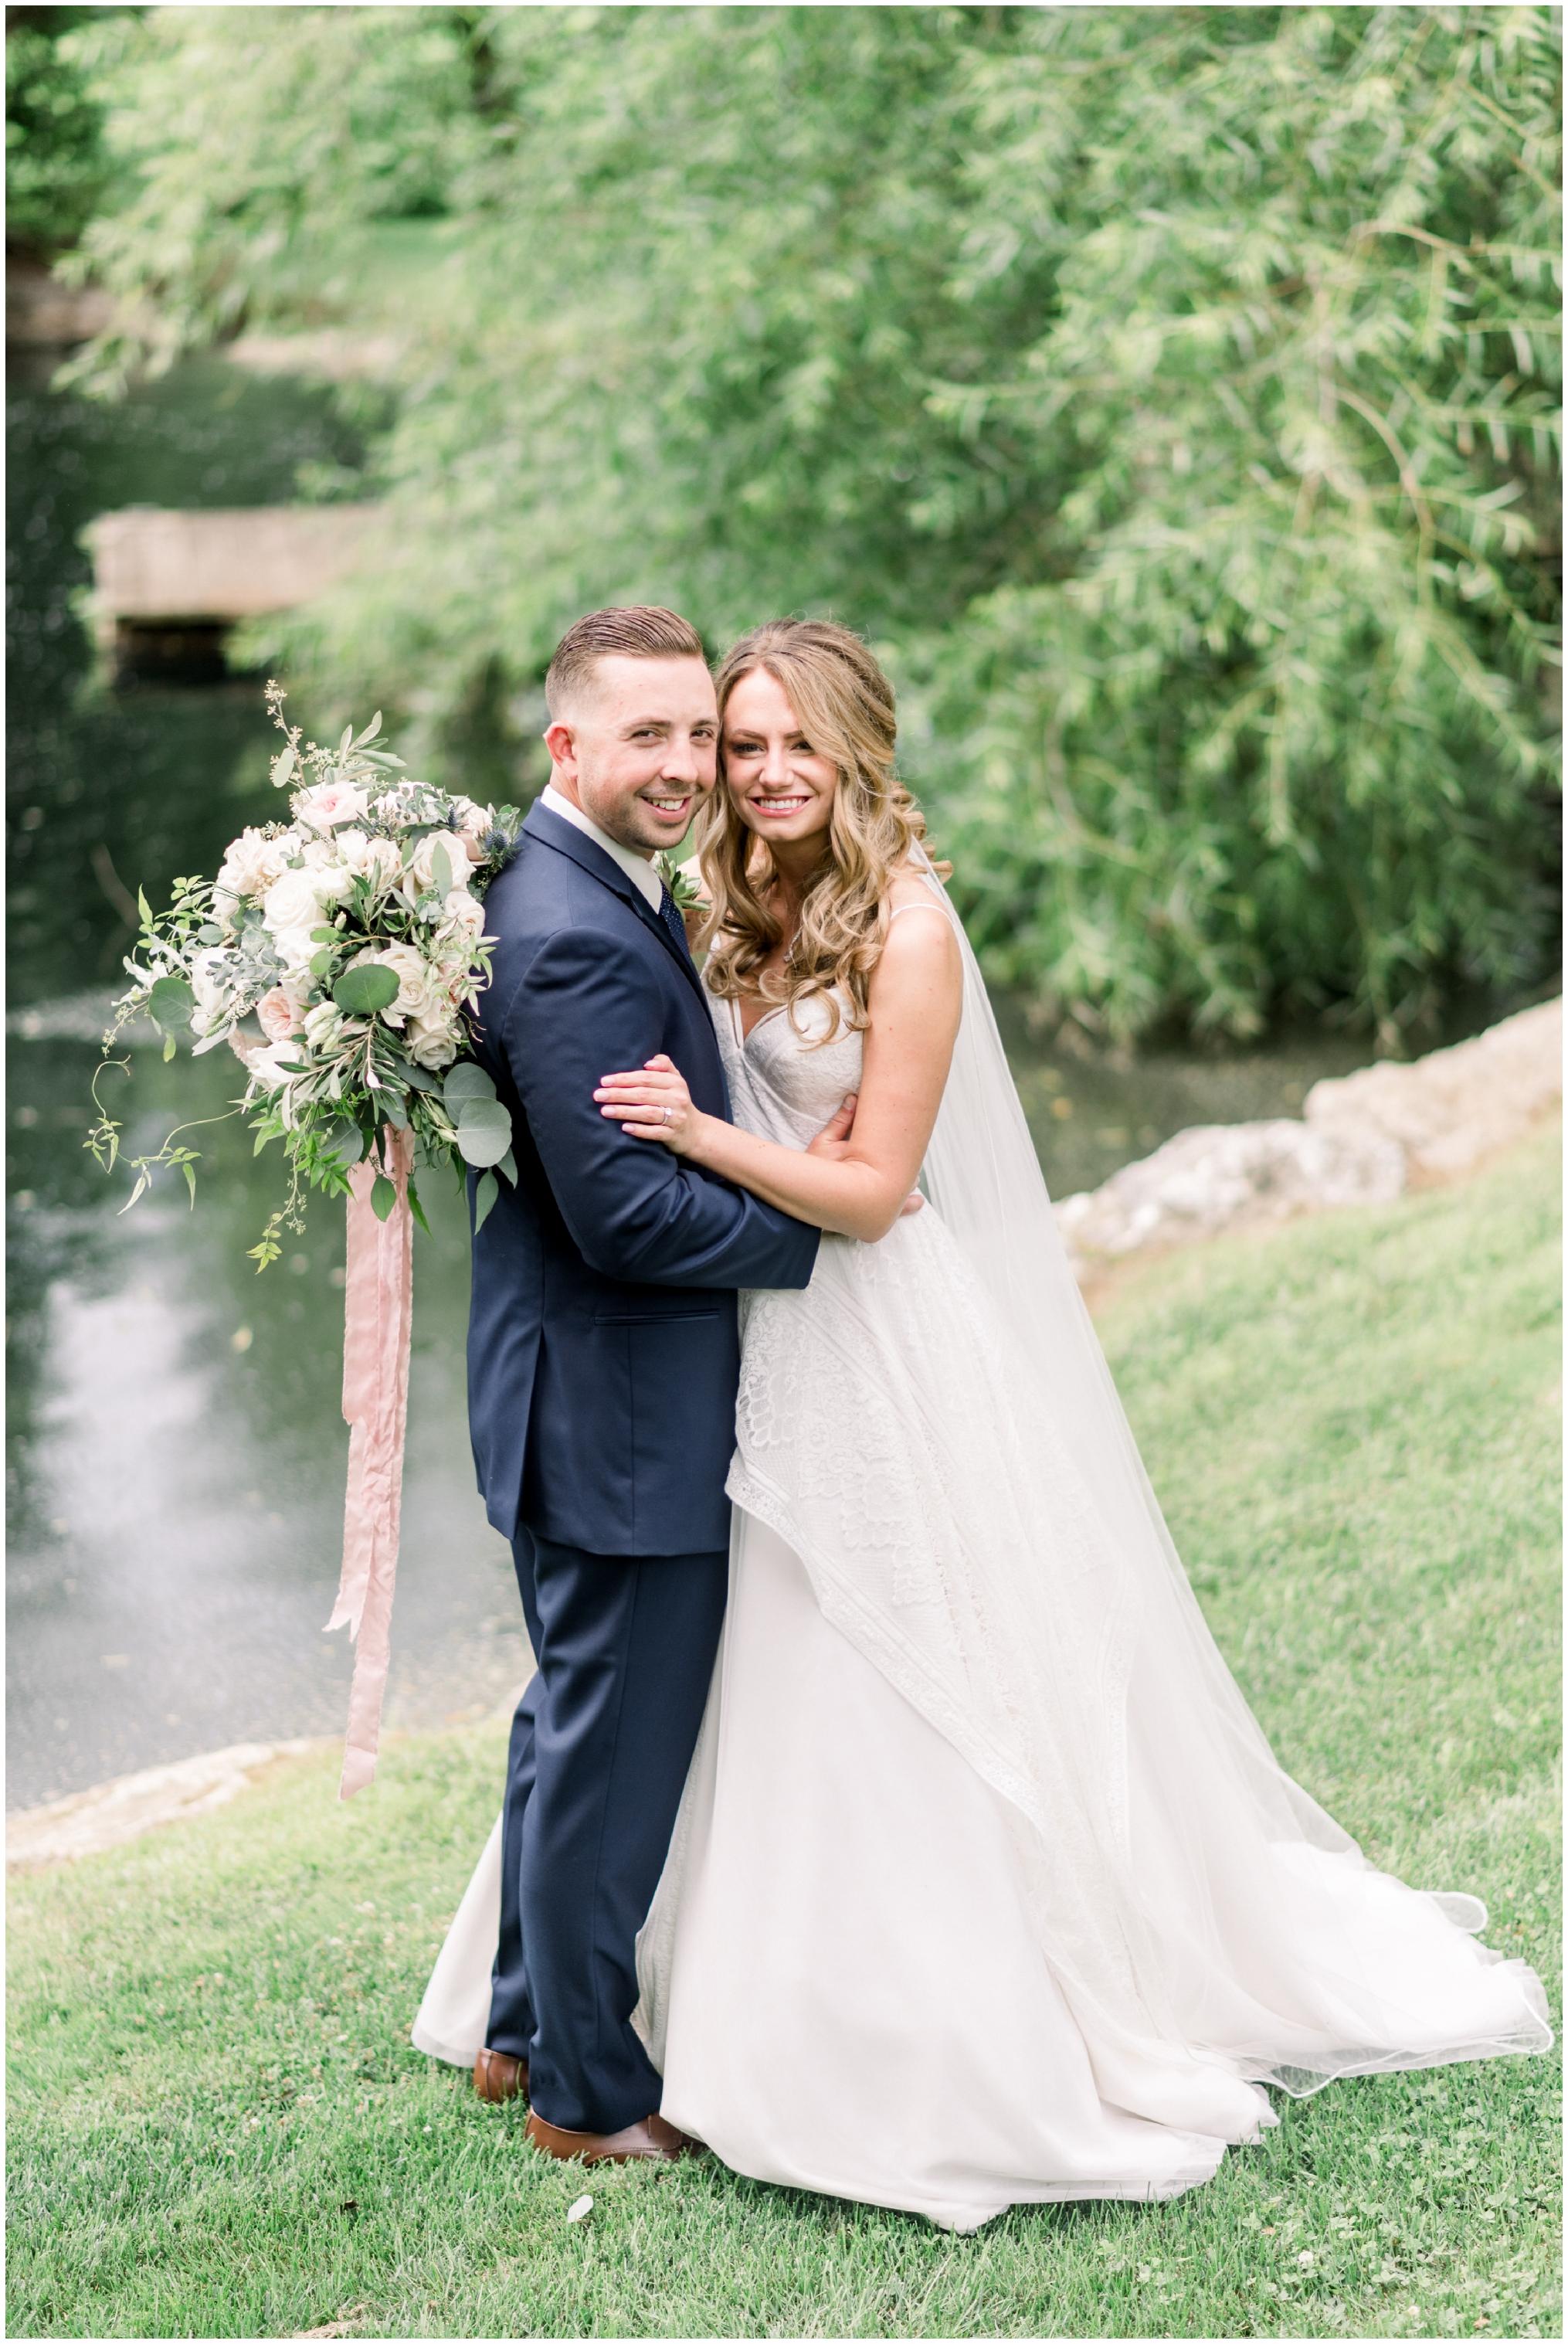 Krista Brackin Photography | July Wedding at The Farm at Eagle's Ridge_0014.jpg